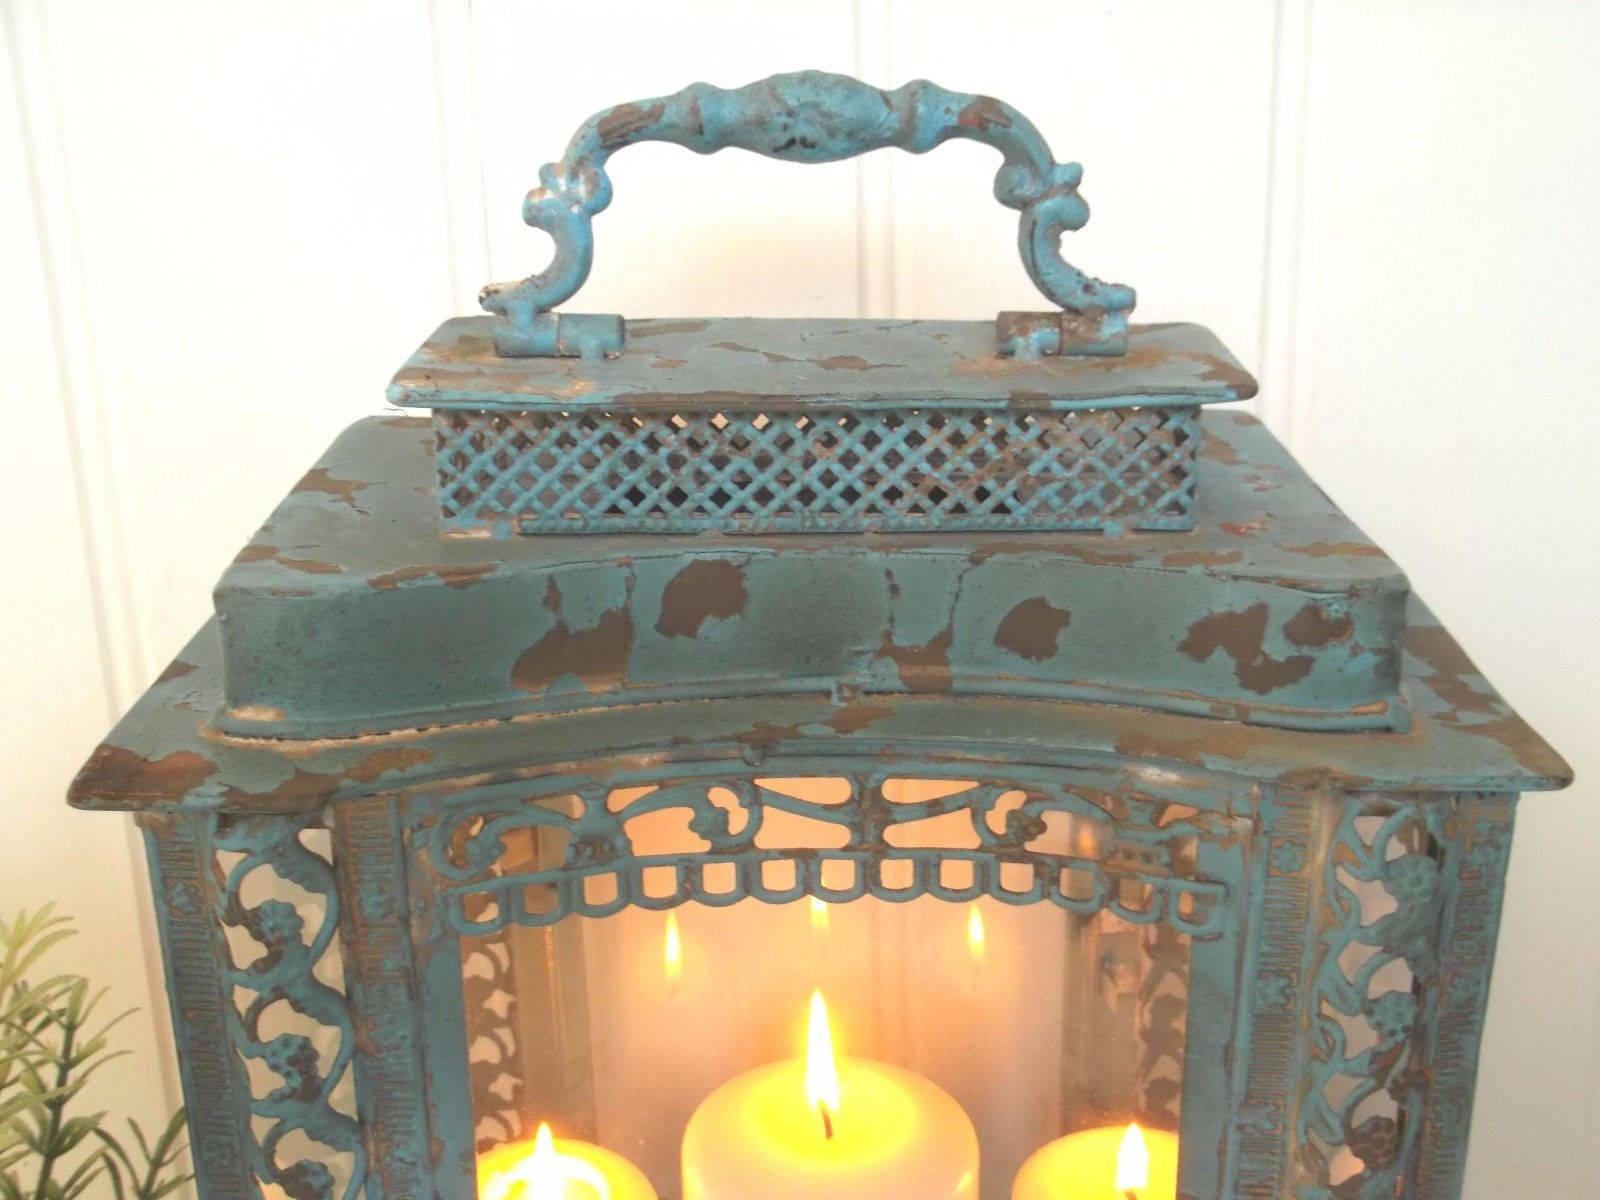 Large French Vintage Style Lantern Candle Holder Shabby Chic Antique Country Amazing Grace